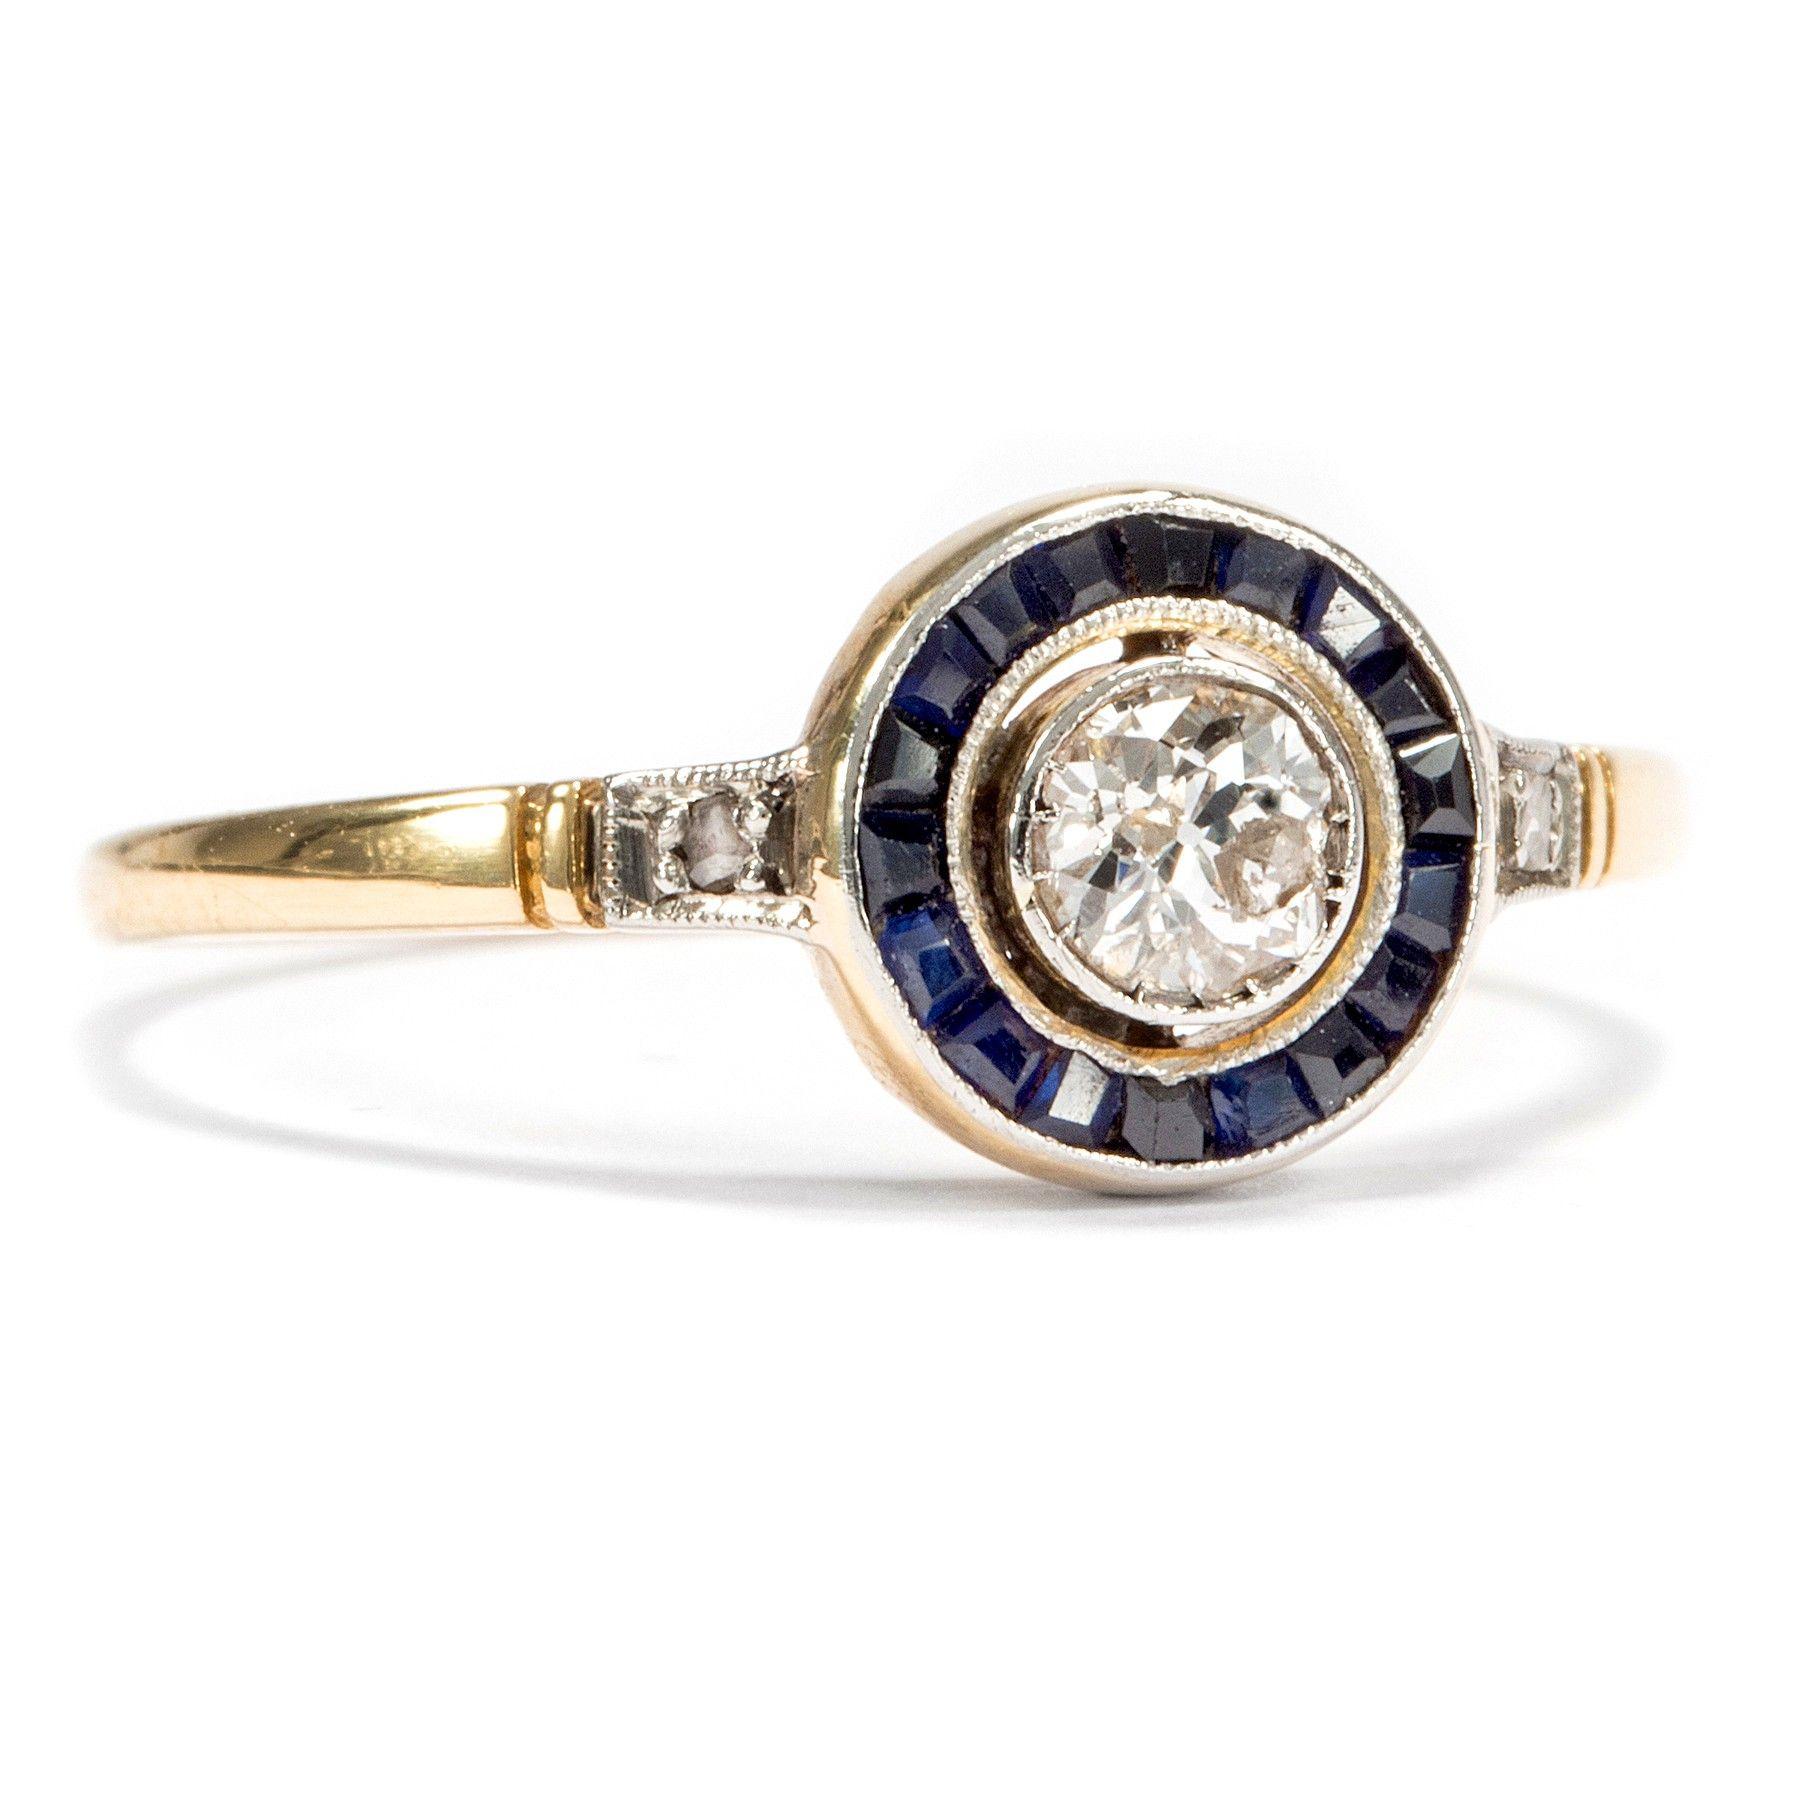 Hallo Halo! - Eleganter Saphir & Altschliff Diamant Ring in Gold, um 1910. Photo © 2015 Hofer Antikschmuck Berlin